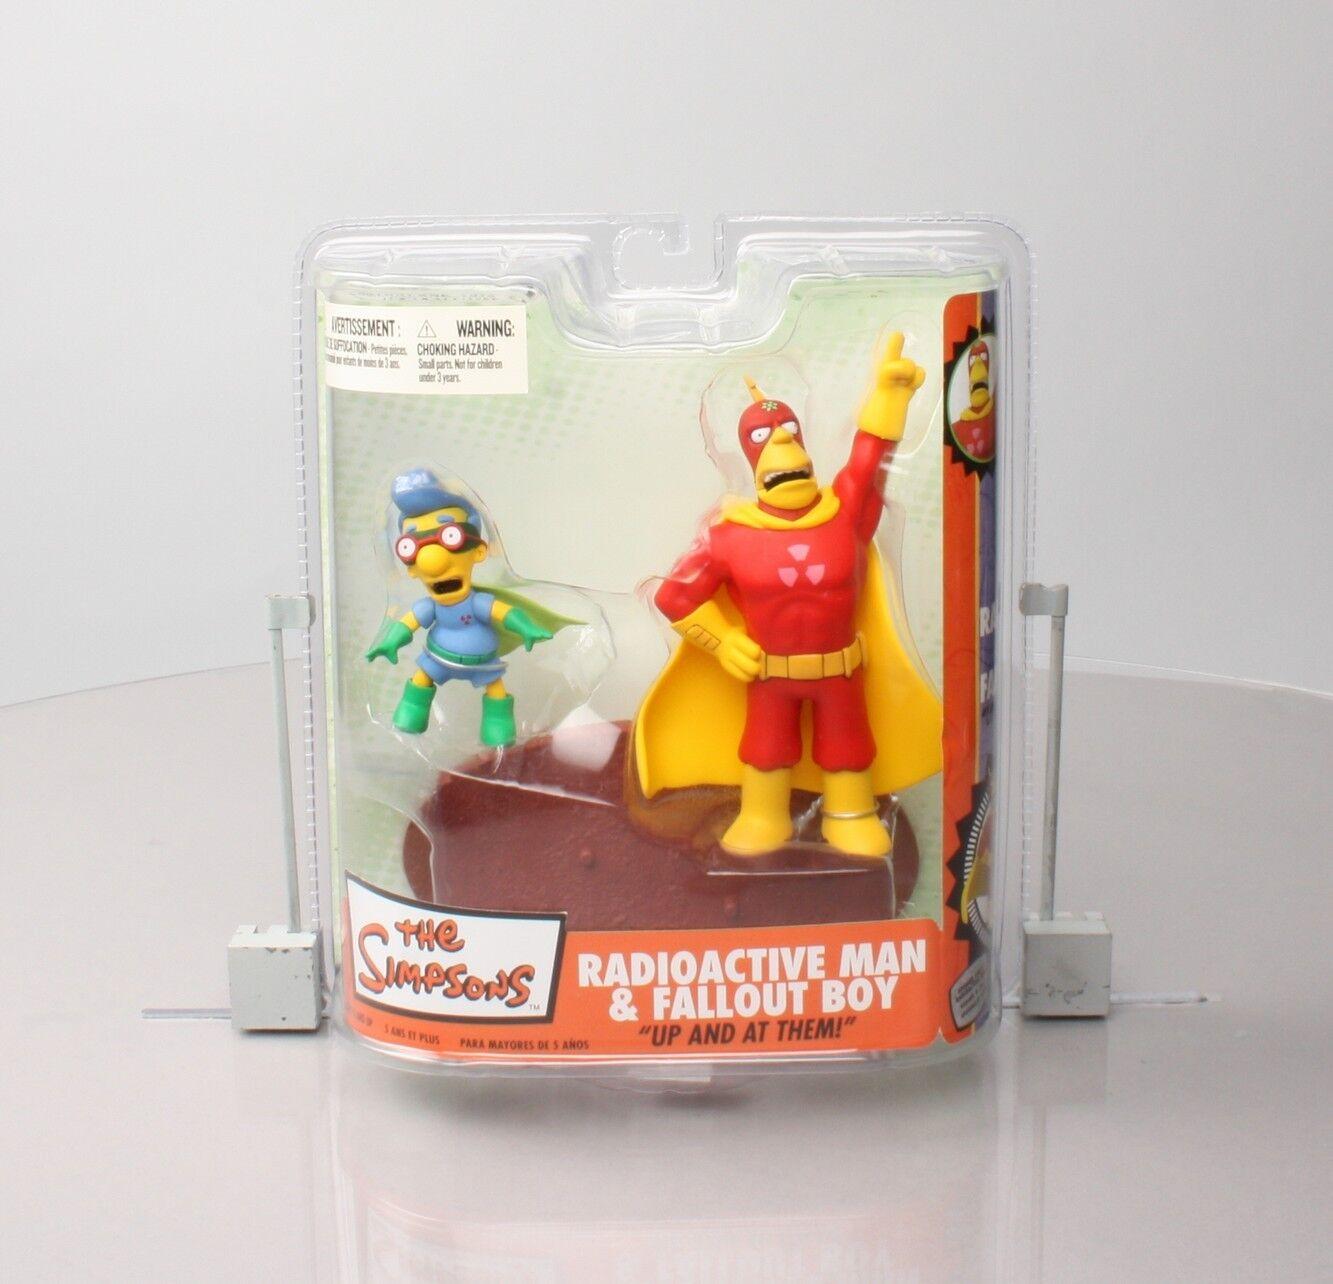 Simpsons Series 2 - Radioactive Man & Fallout Boy